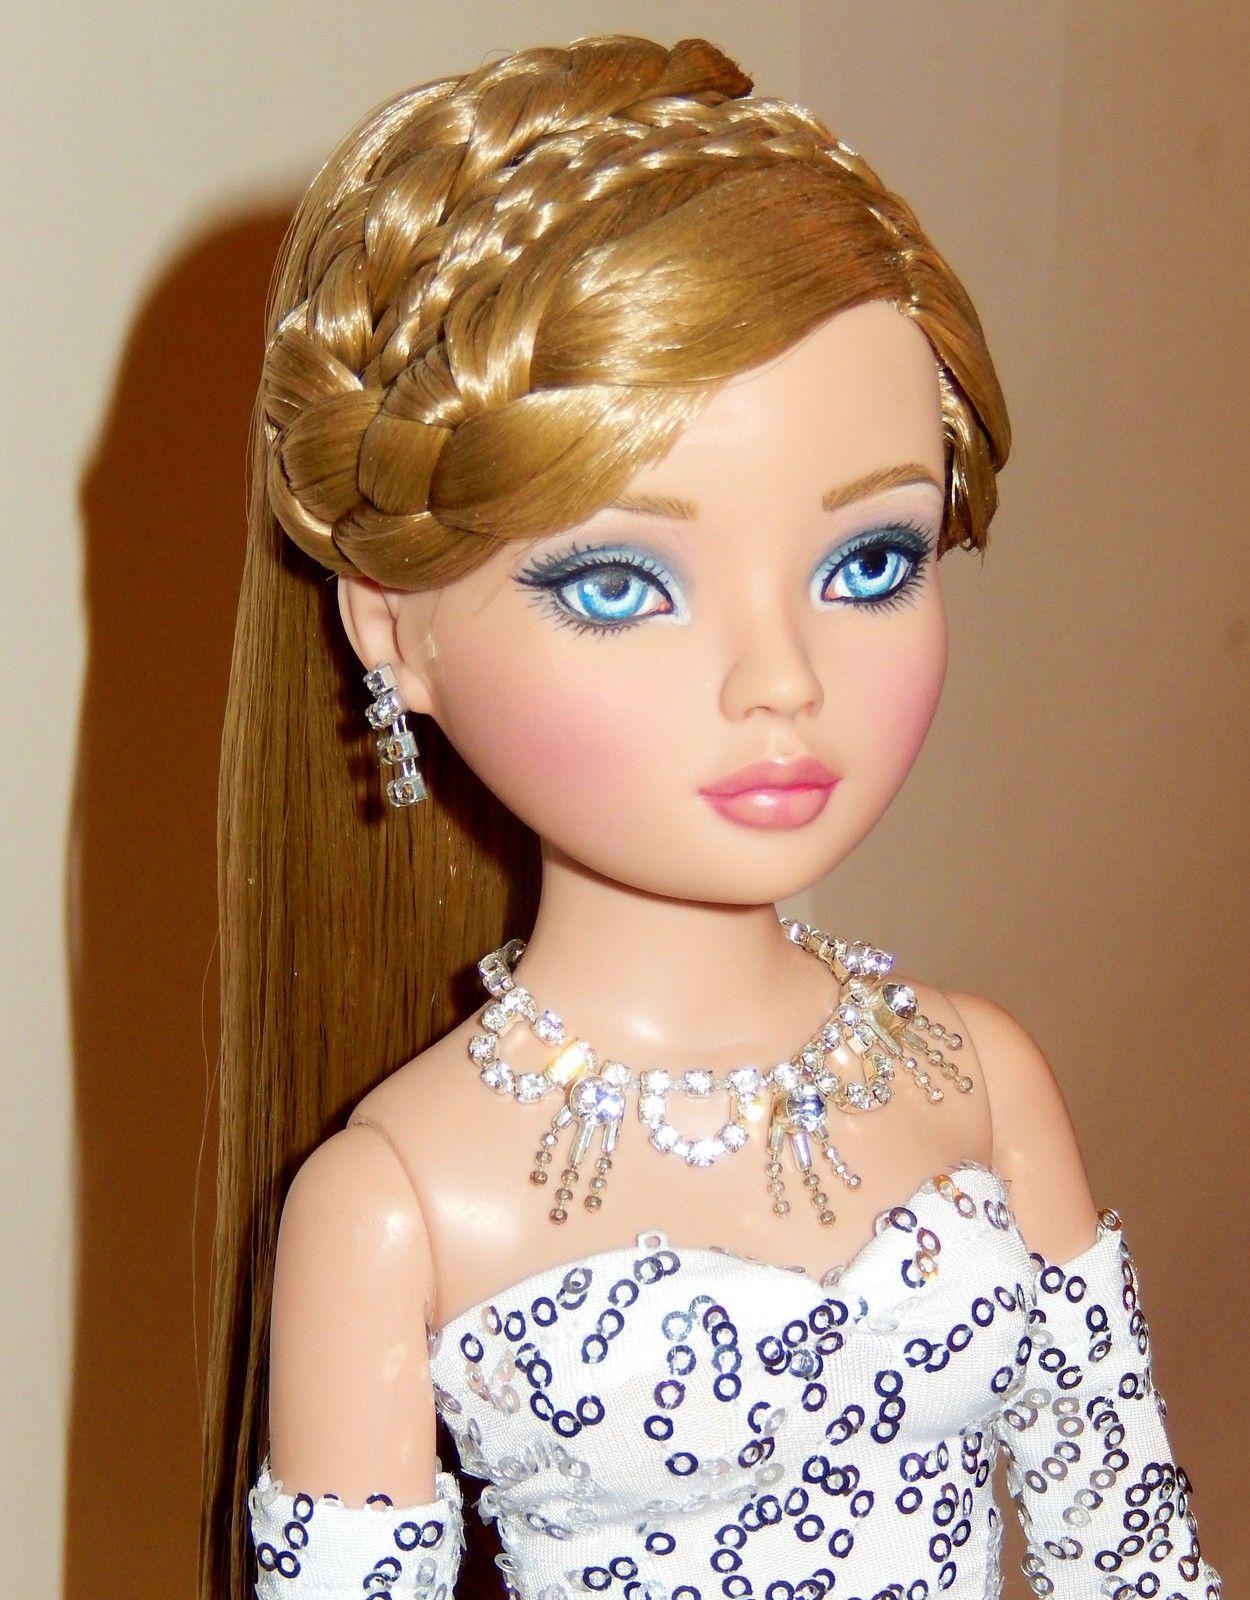 Tonner Ellowyne Wilde OOAK Timid Tan Repaint Doll Cindy Lorimer NUDE